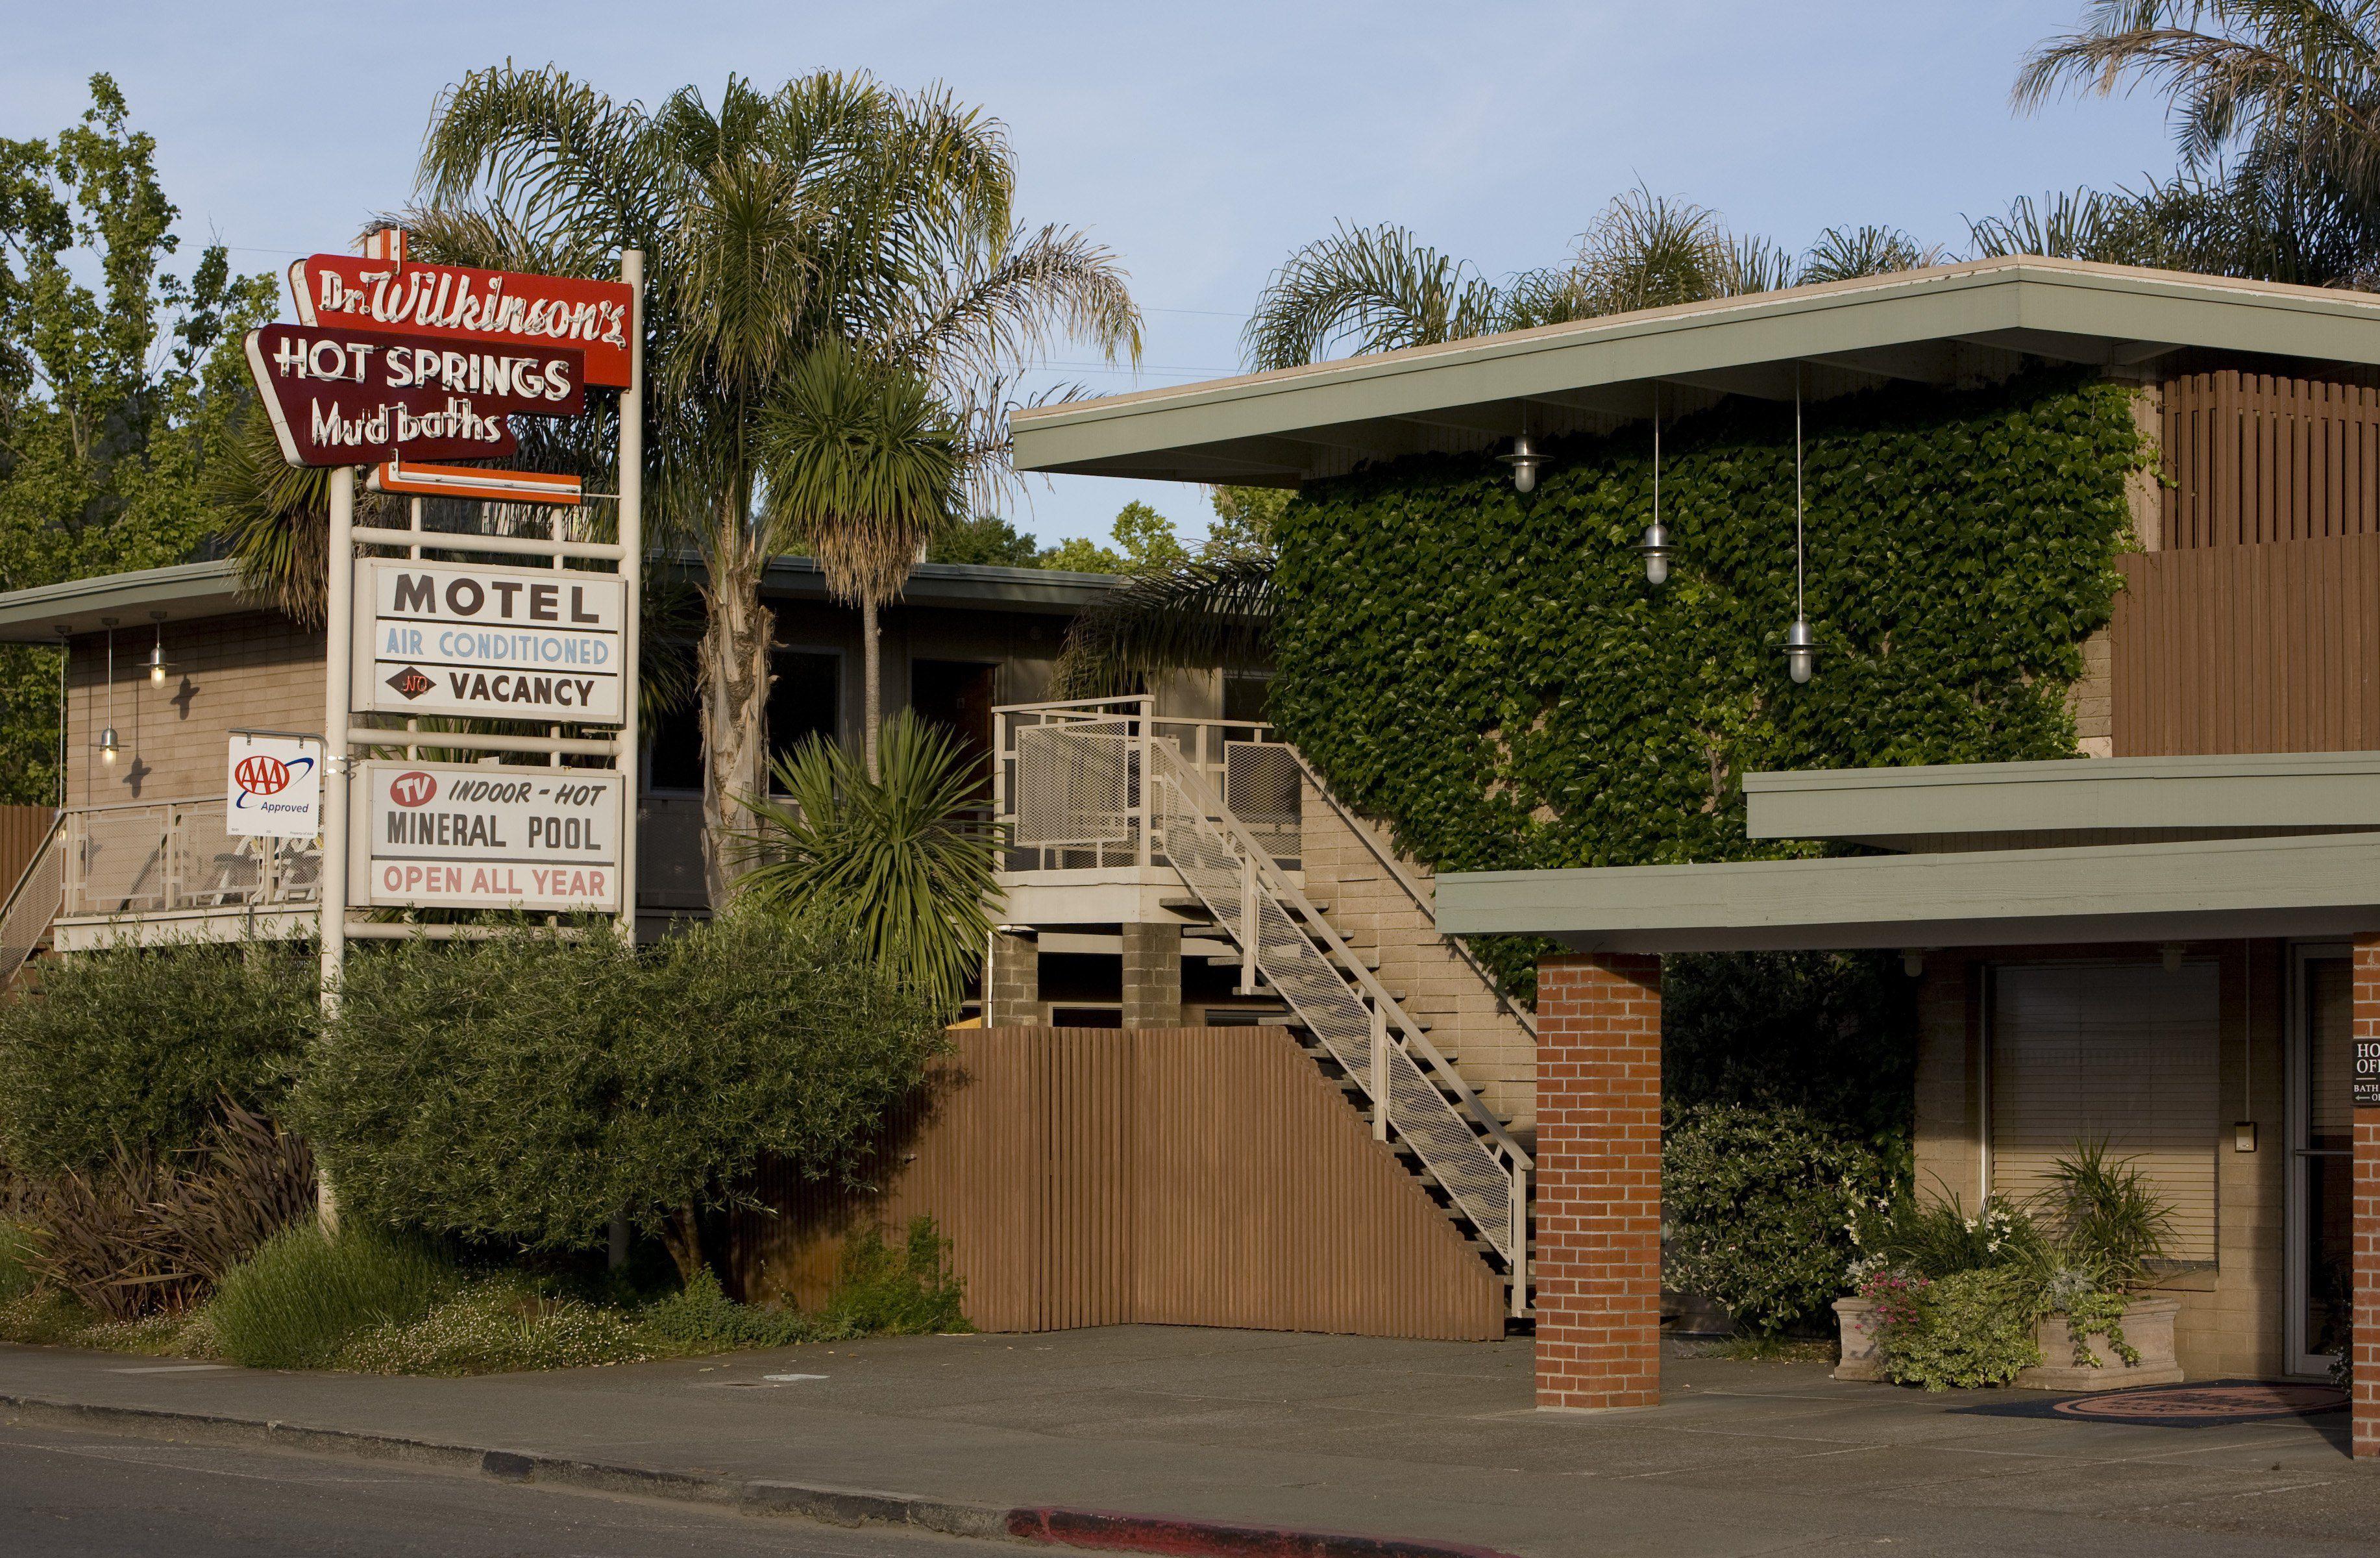 Dr. Wilkinson's hot springs and mineral bath motel, Calistoga, California